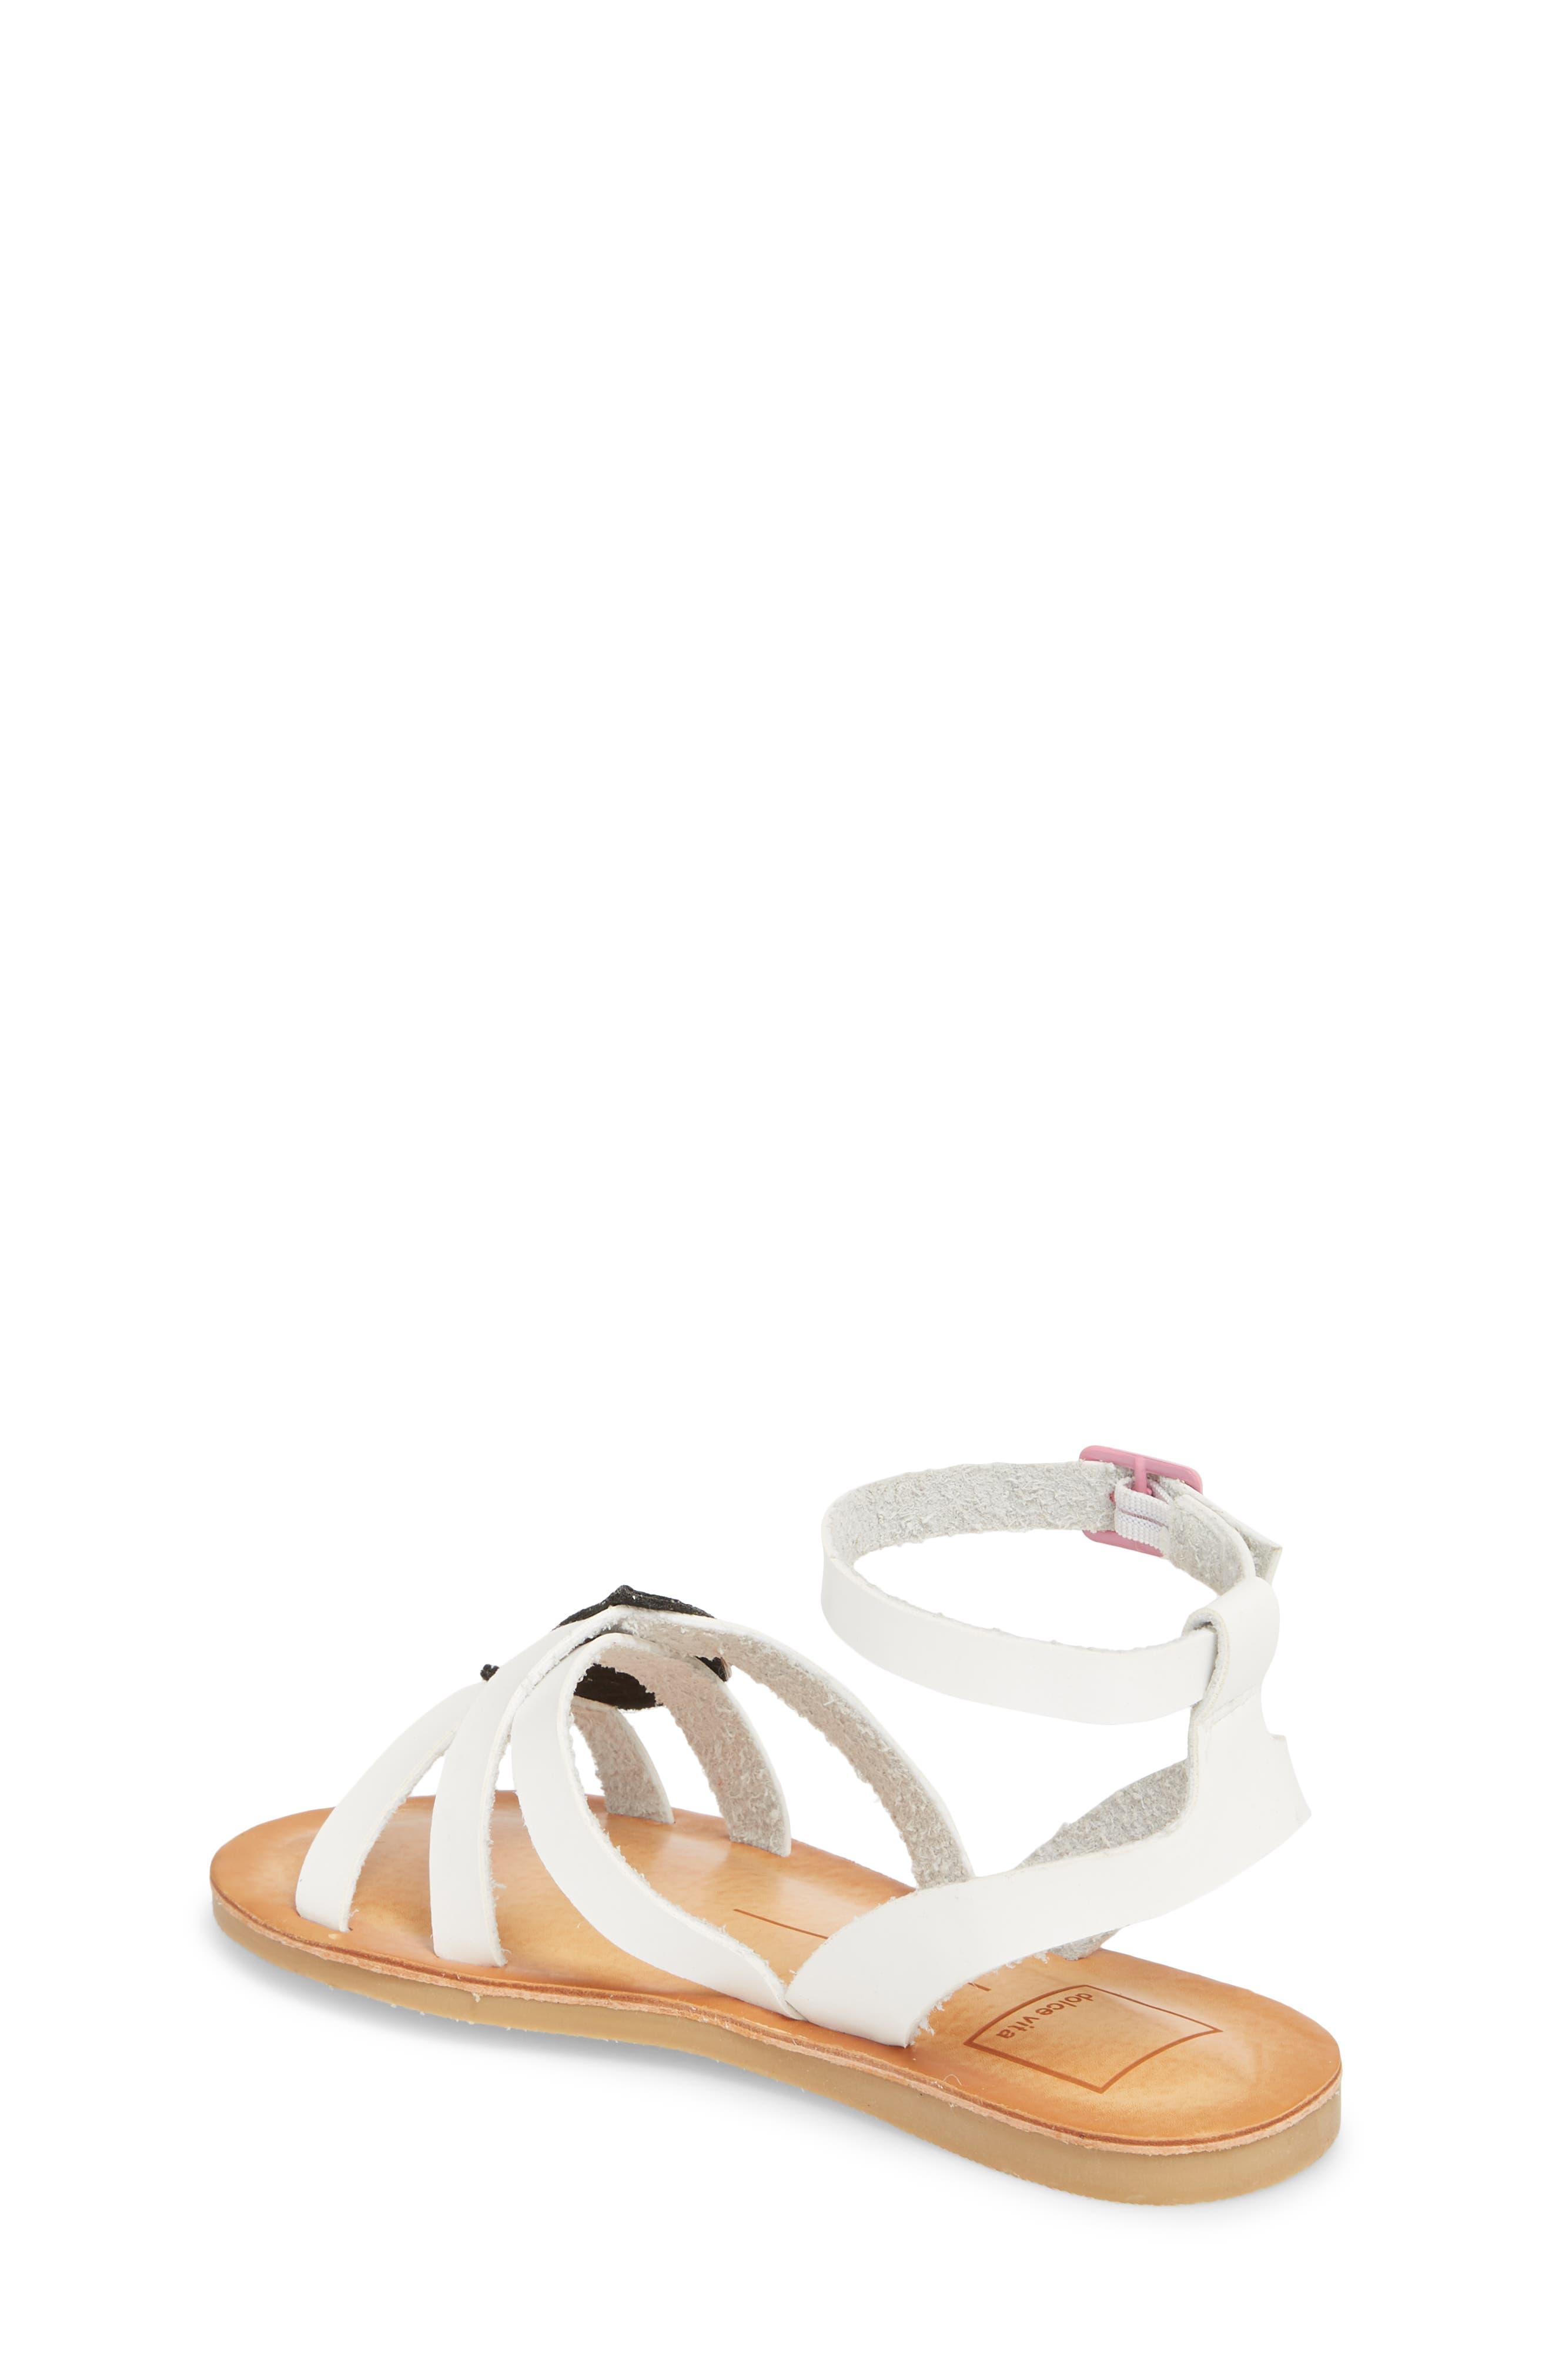 Jaclin Fruit Sequined Sandal,                             Alternate thumbnail 2, color,                             White